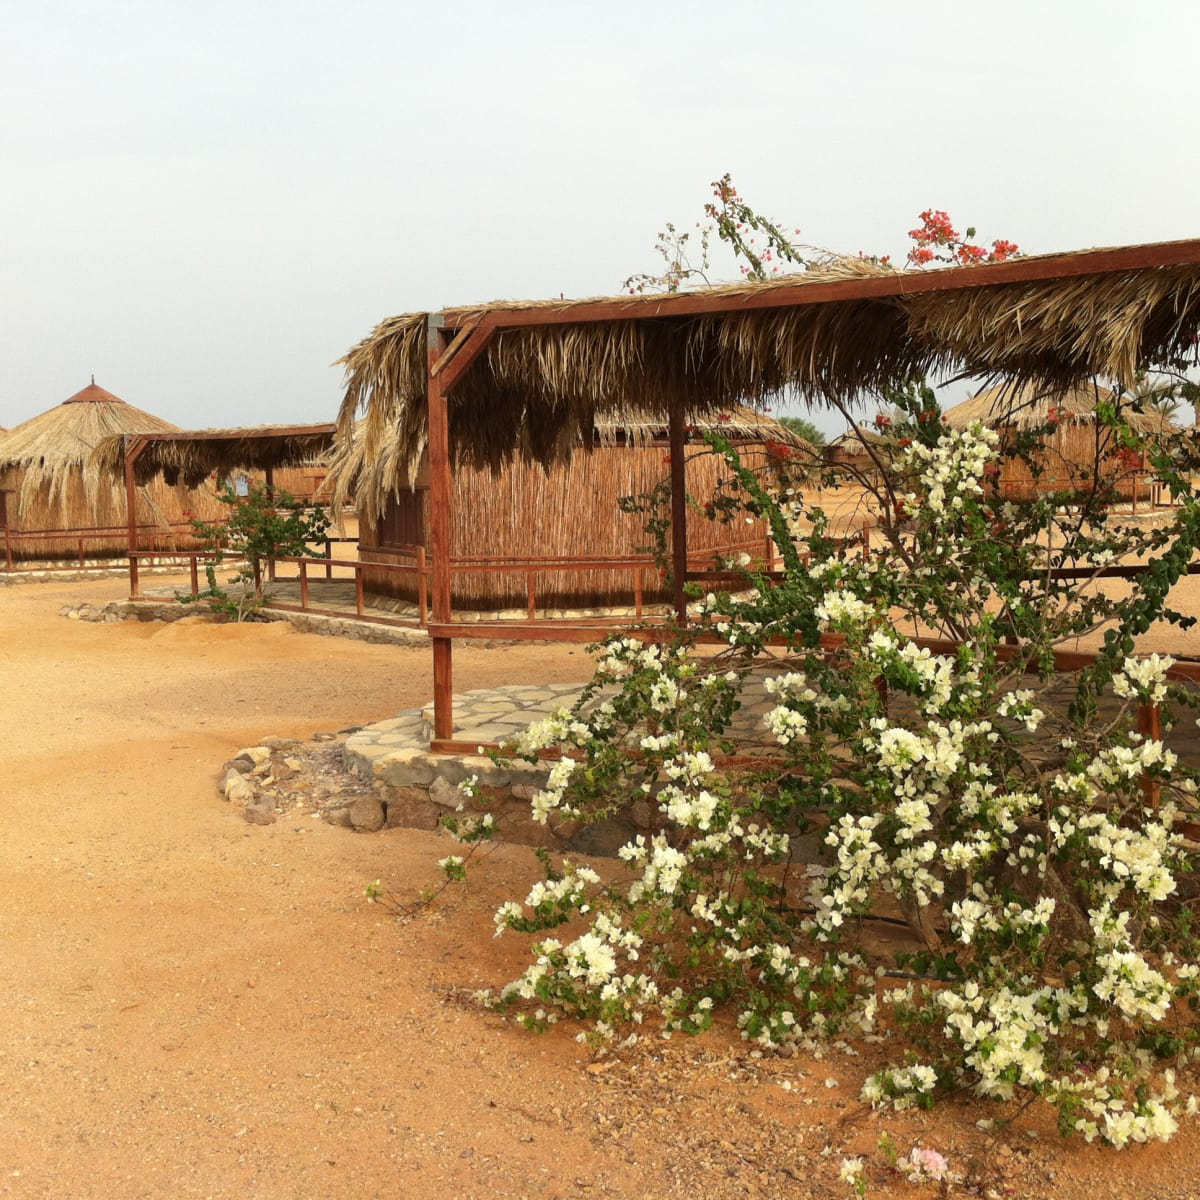 Bougainvillea-shaded huts at Mutawea's camp, Castle Beach Sinai Egypt